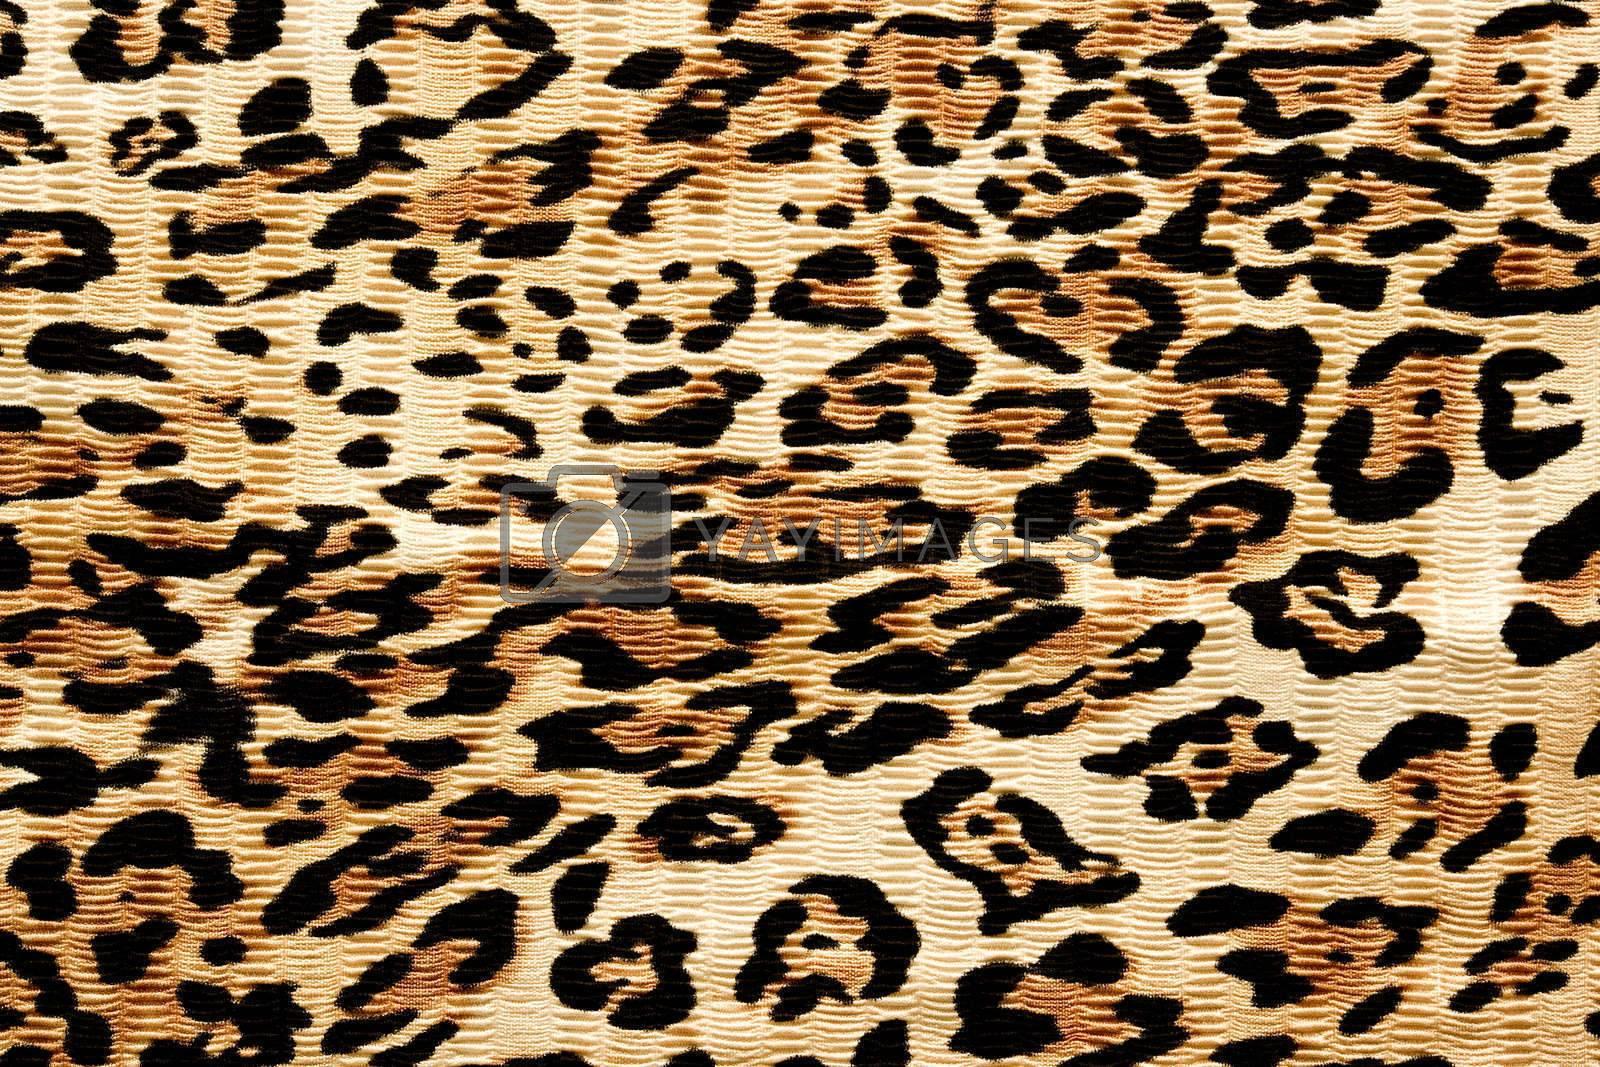 wallpaper of tiger texture. animal skin photo